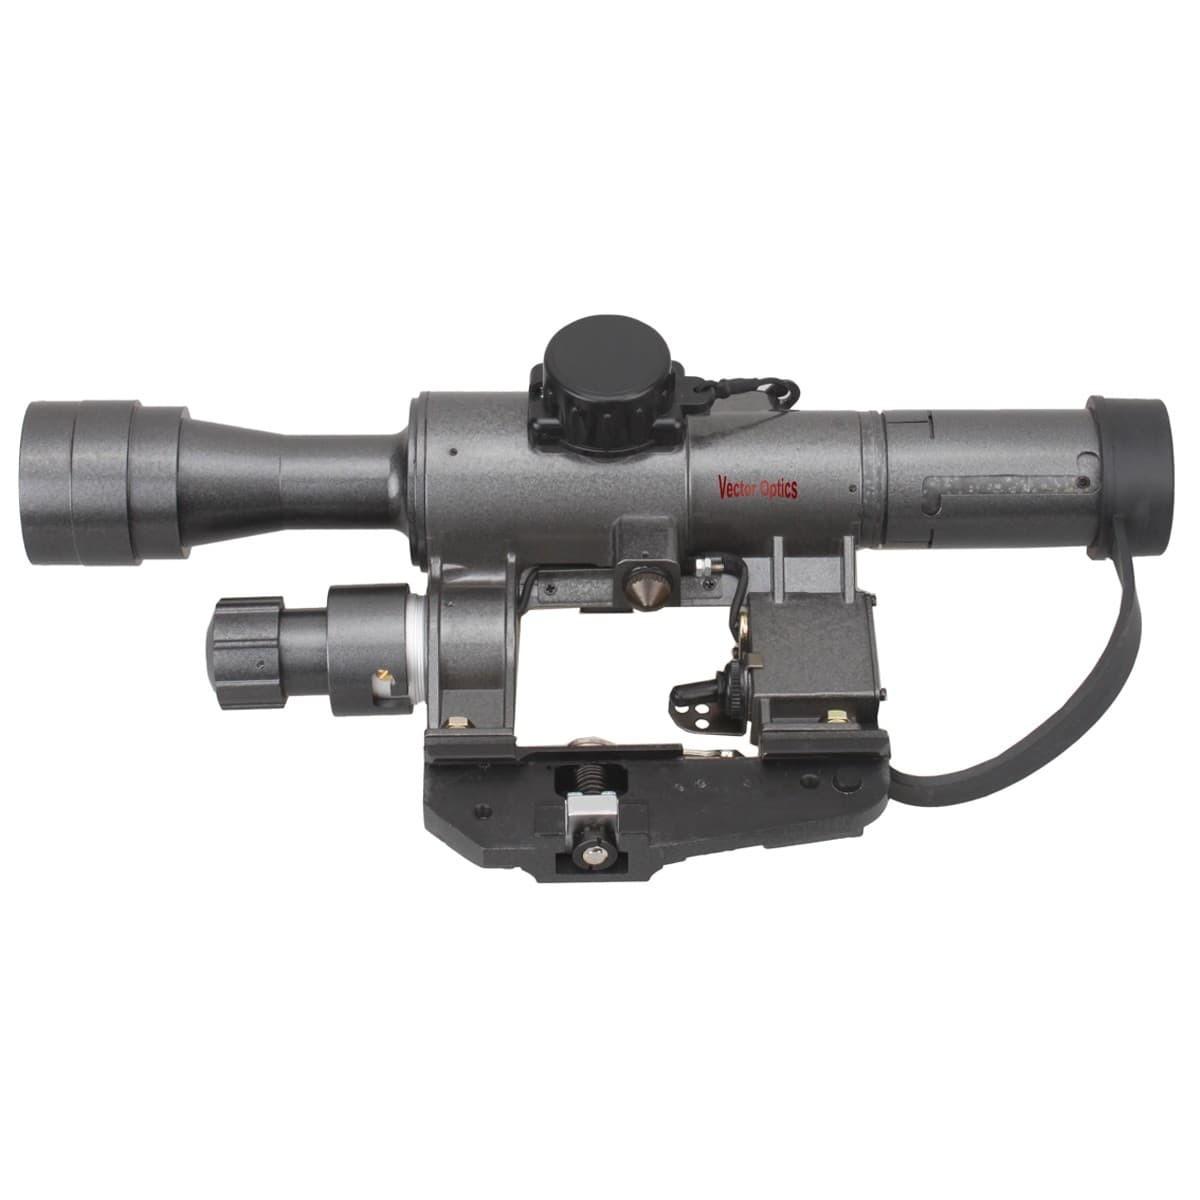 SVD Dragunov 4x24FFP Riflescope